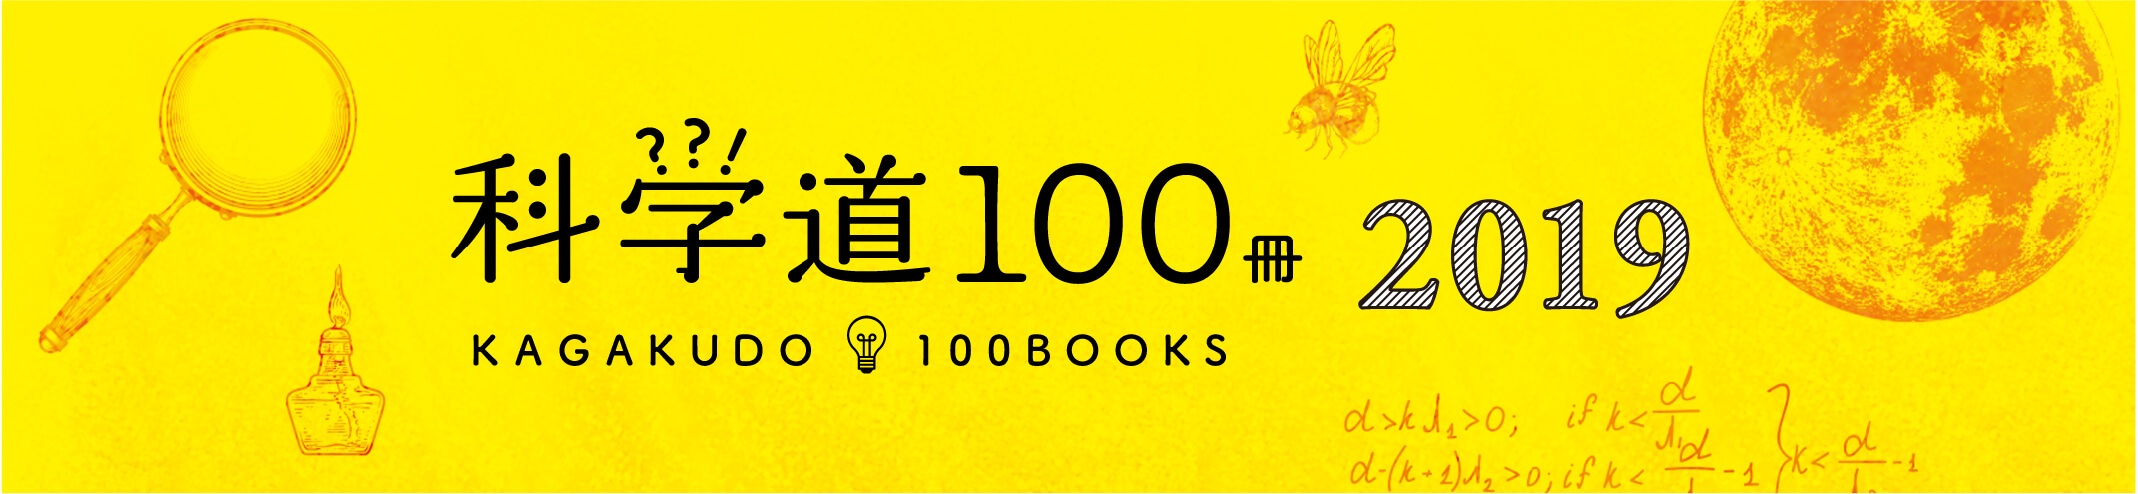 KAGAKUDO 100BOOKS 科学道100冊(2019)「知りたい!」が未来をつくる